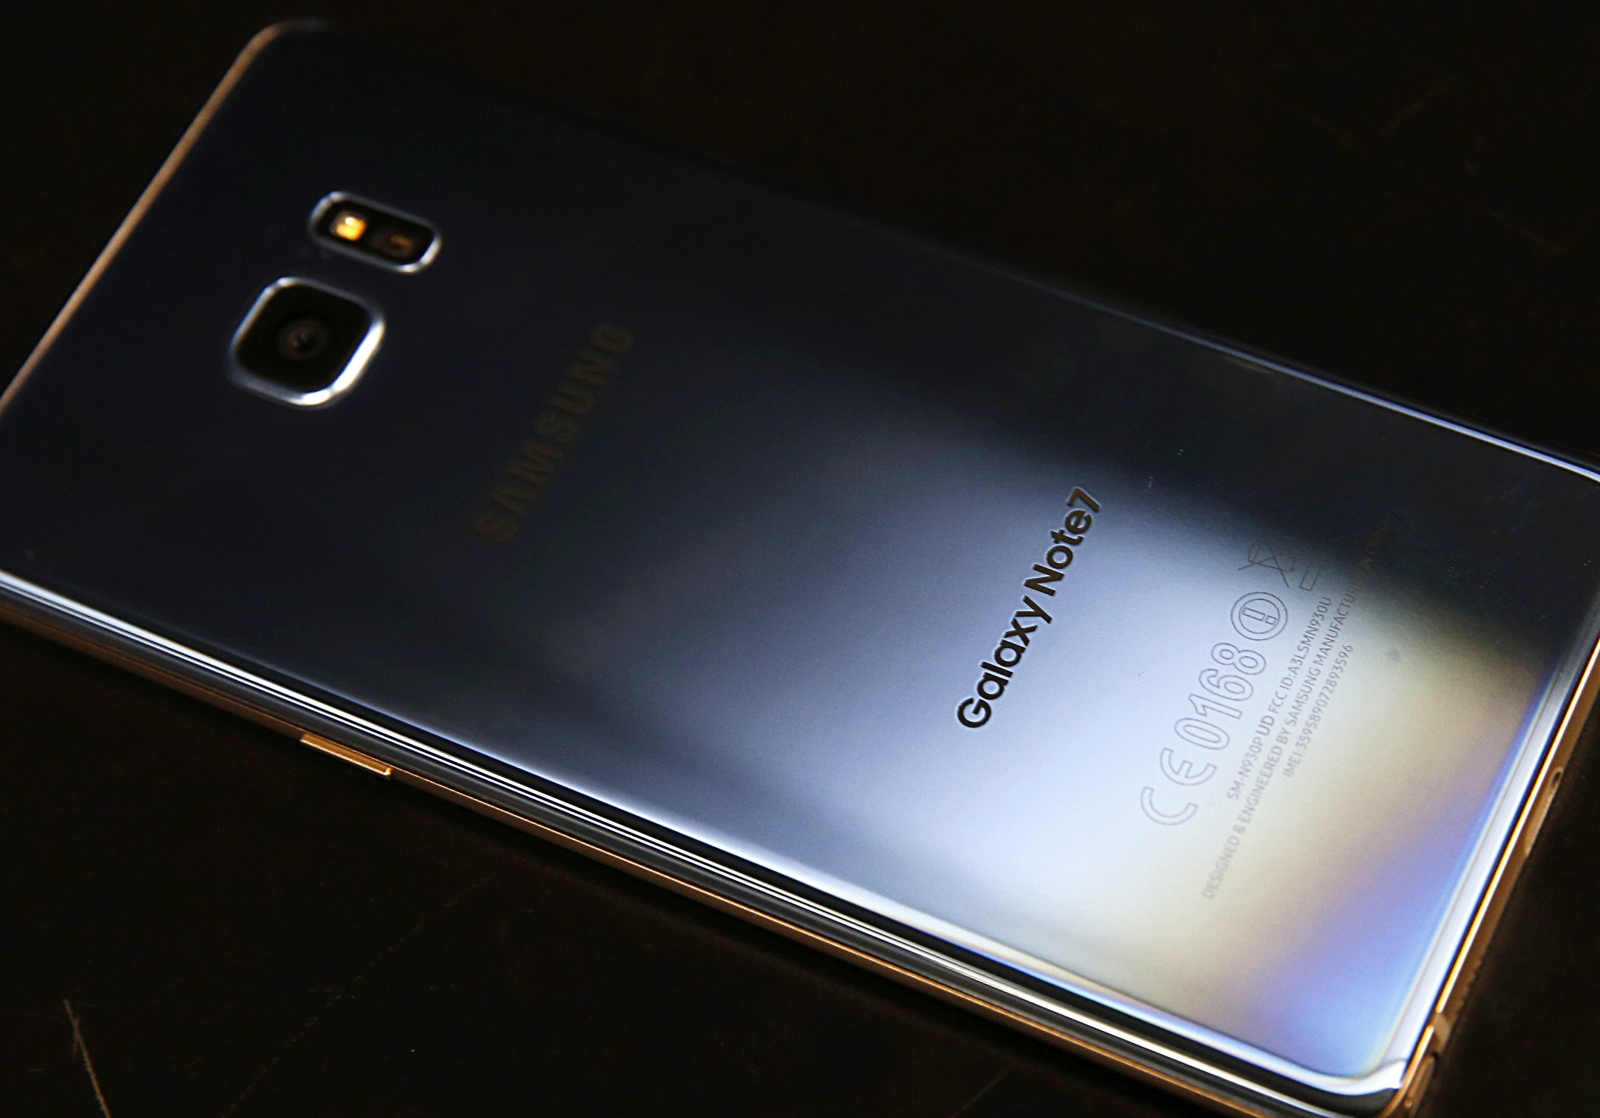 Samsung sued over Galaxy Note 7 explosion